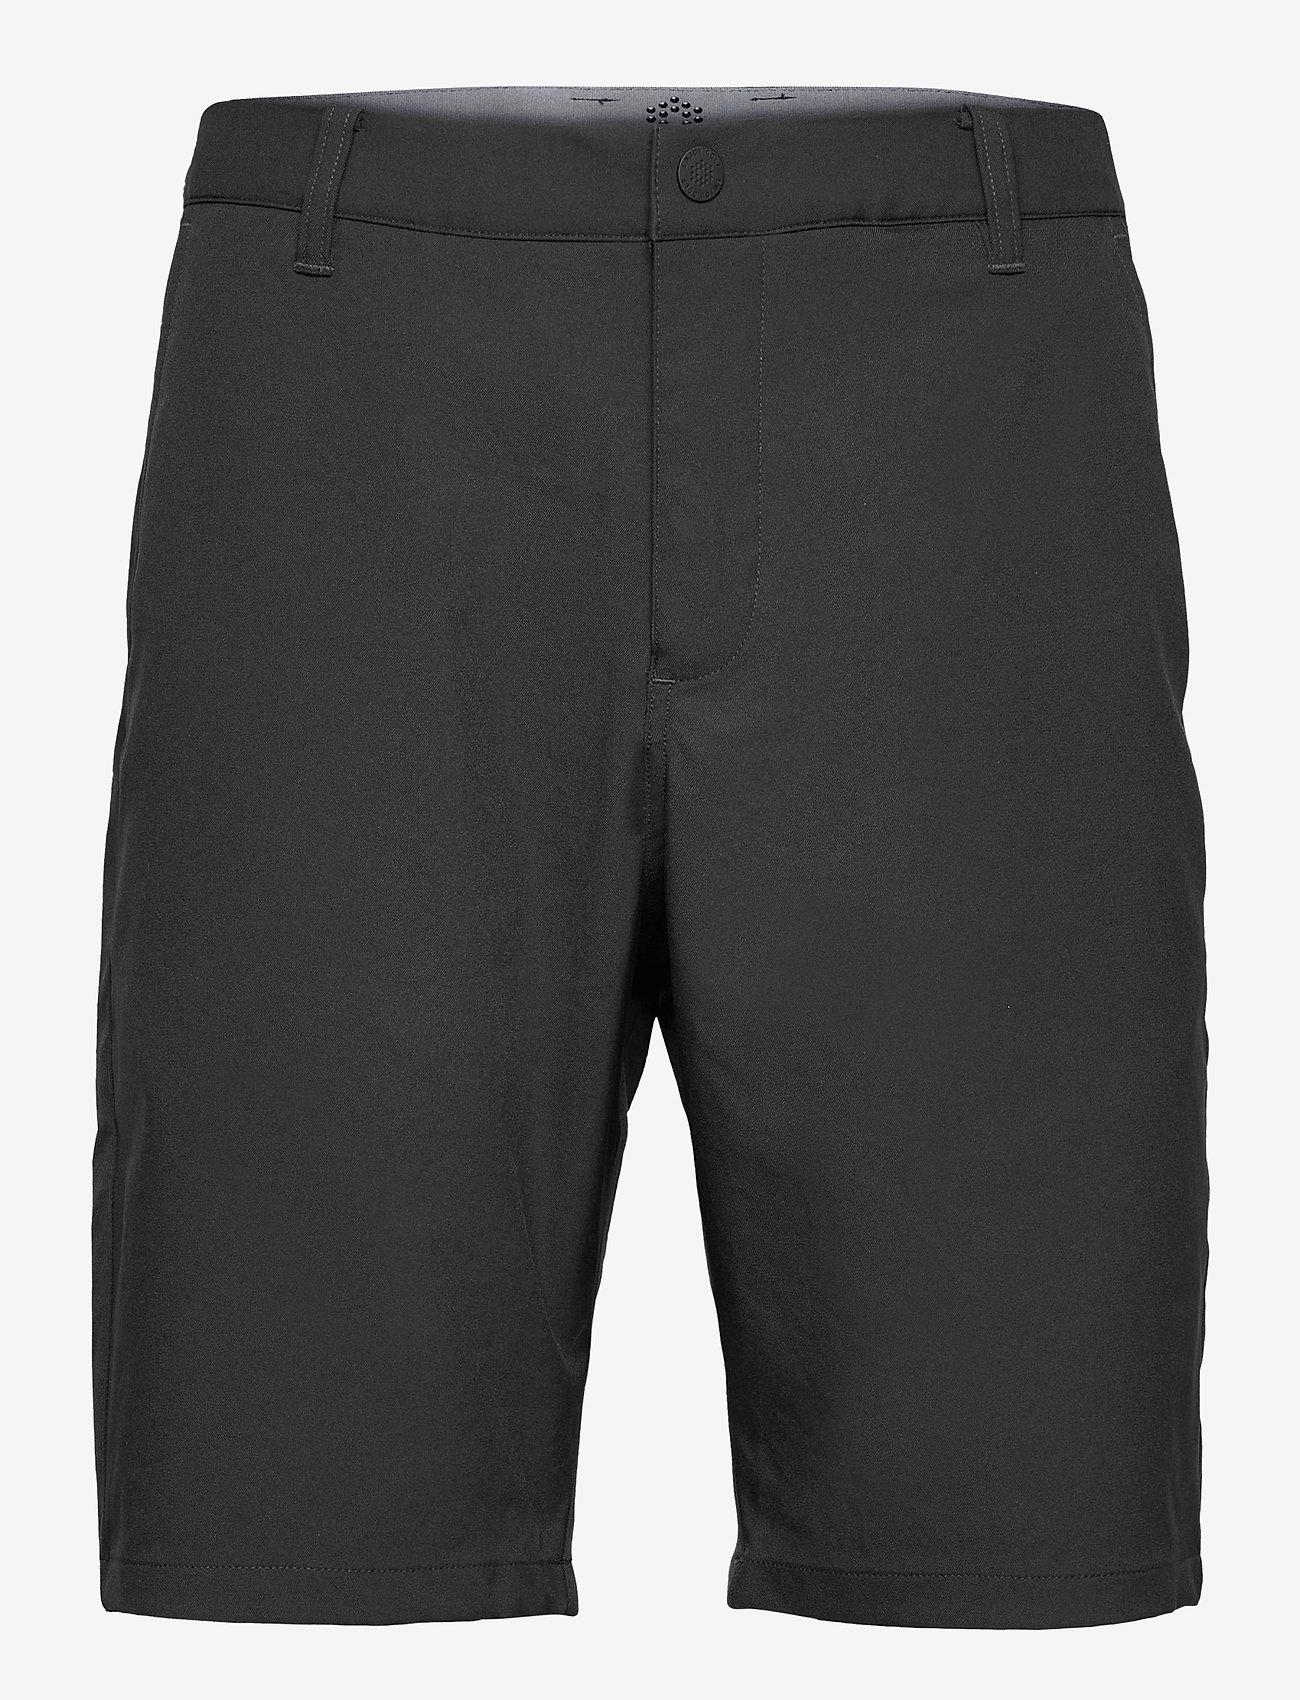 PUMA Golf - Jackpot Short - golf shorts - puma black - 0